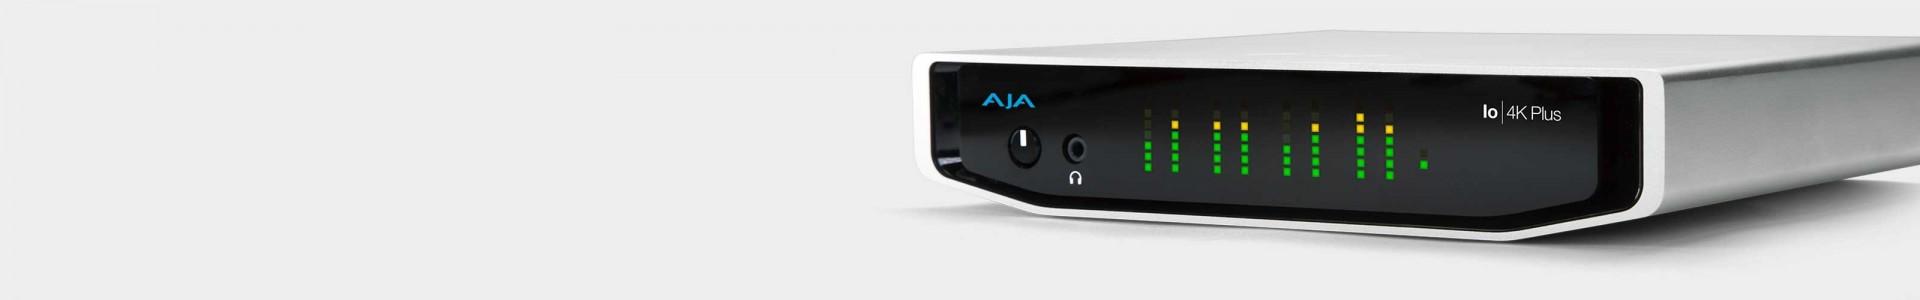 Dispositivi esterni di cattura di video professionali - Avacab